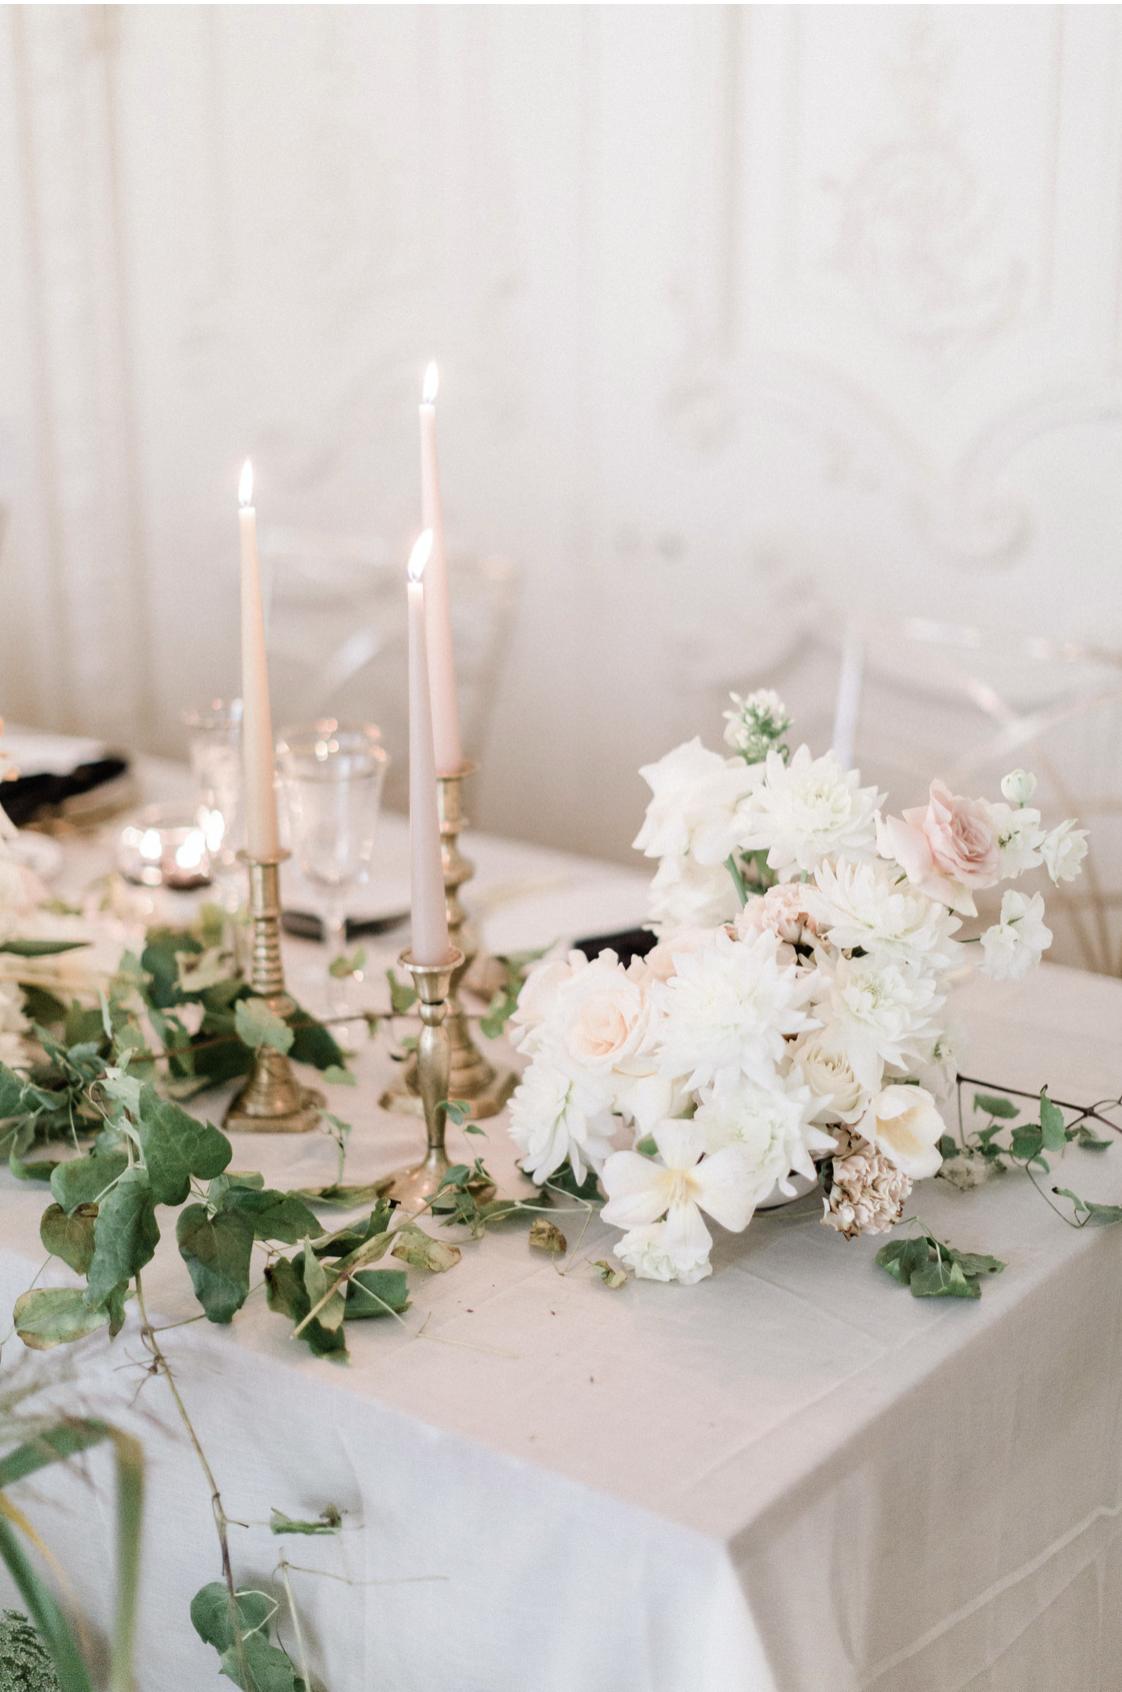 Romantic white wedding centrepiece